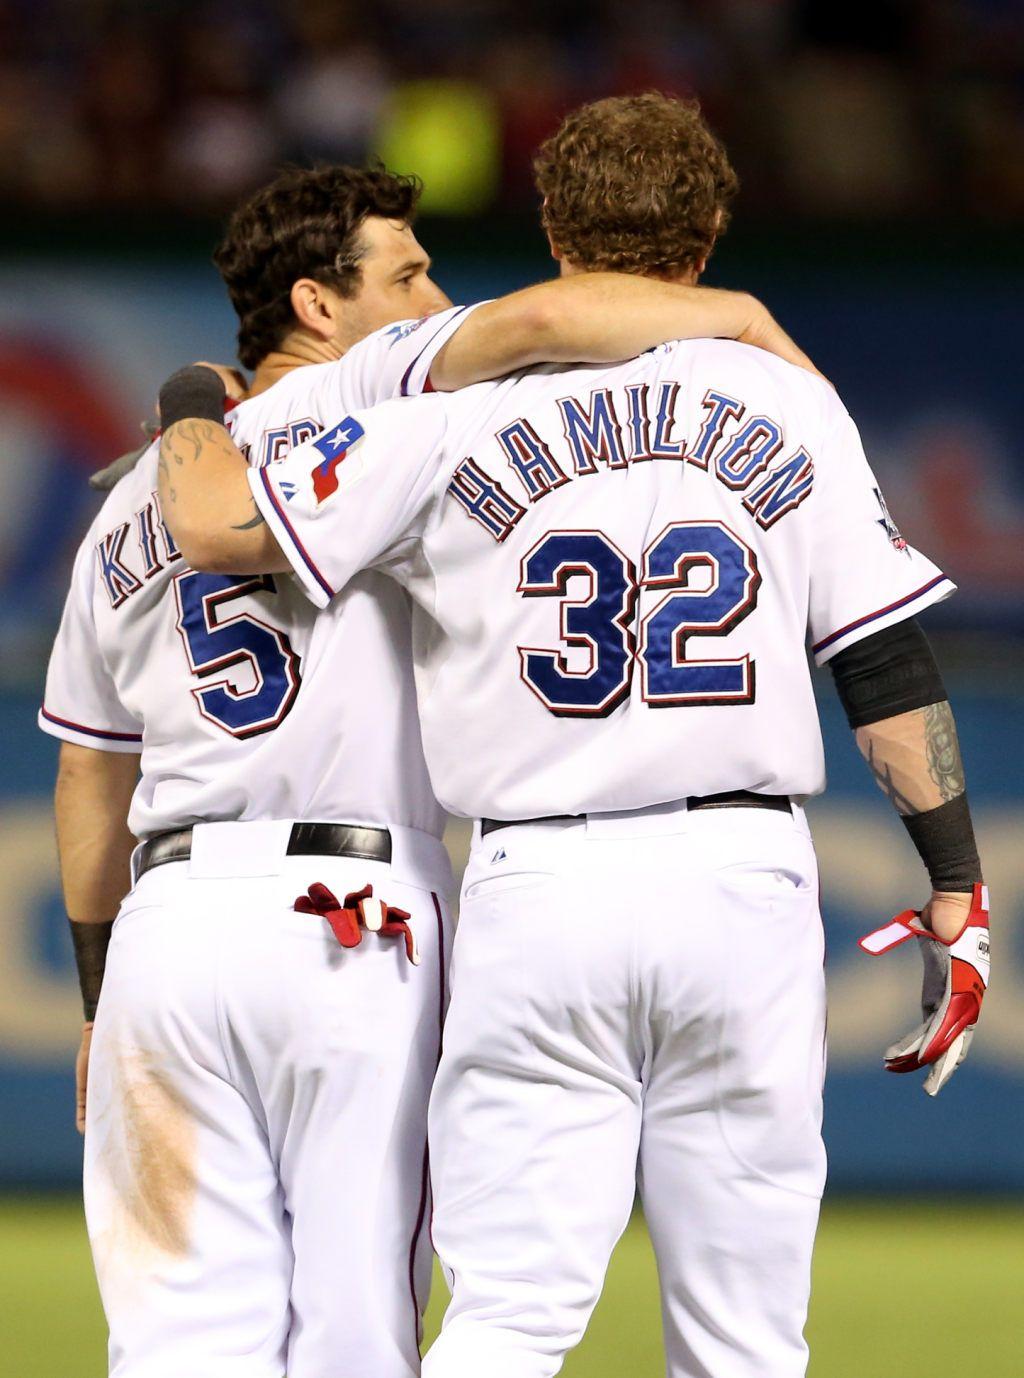 new arrival 37643 20e8d Ian Kinsler and Josh Hamilton of the Texas Rangers talk as ...